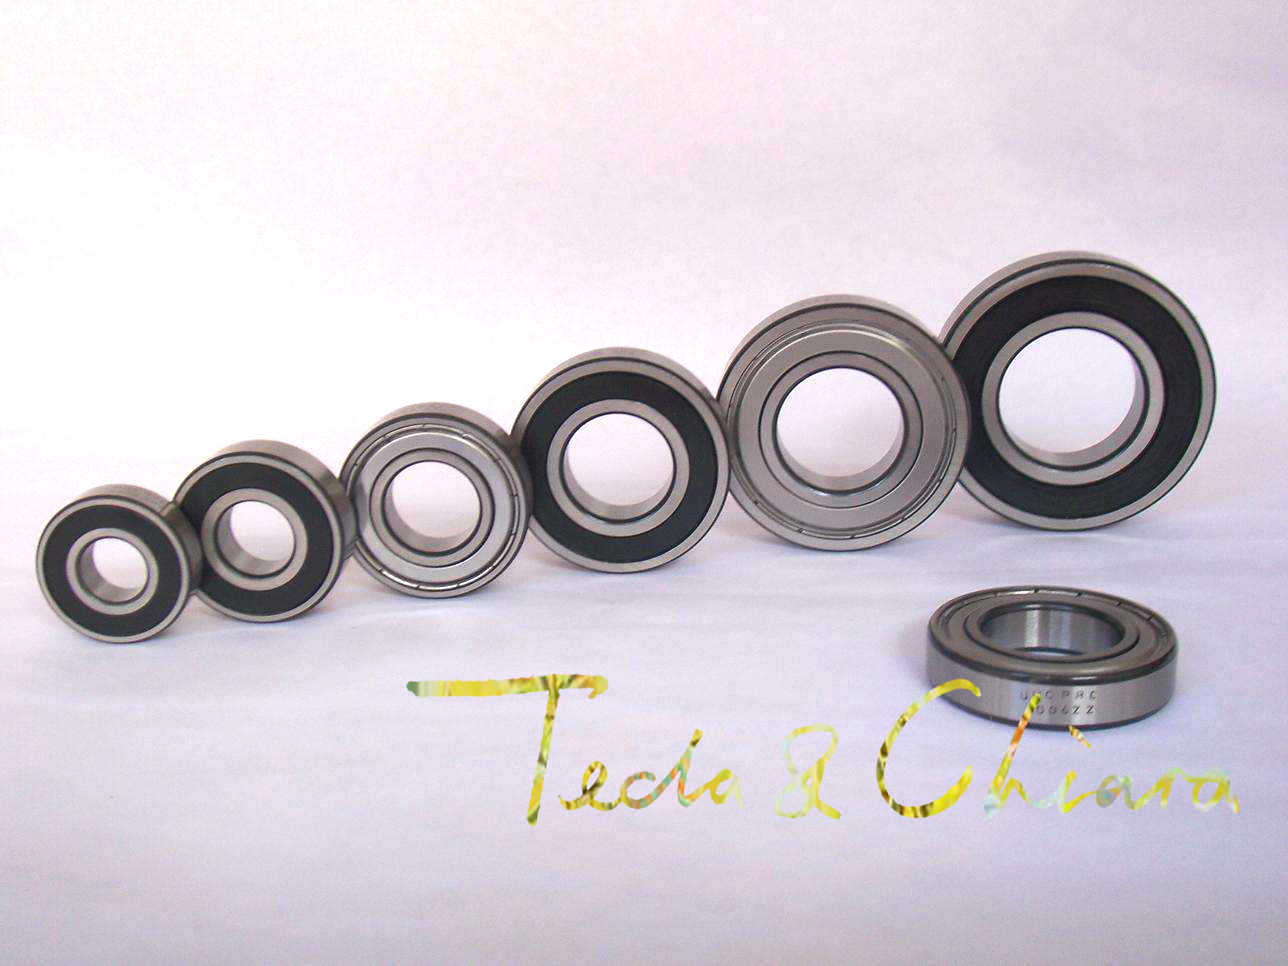 603 603ZZ 603RS 603-2Z 603Z 603-2RS ZZ RS RZ 2RZ Глубокие шаровые подшипники 3x9x5 мм высокого качества